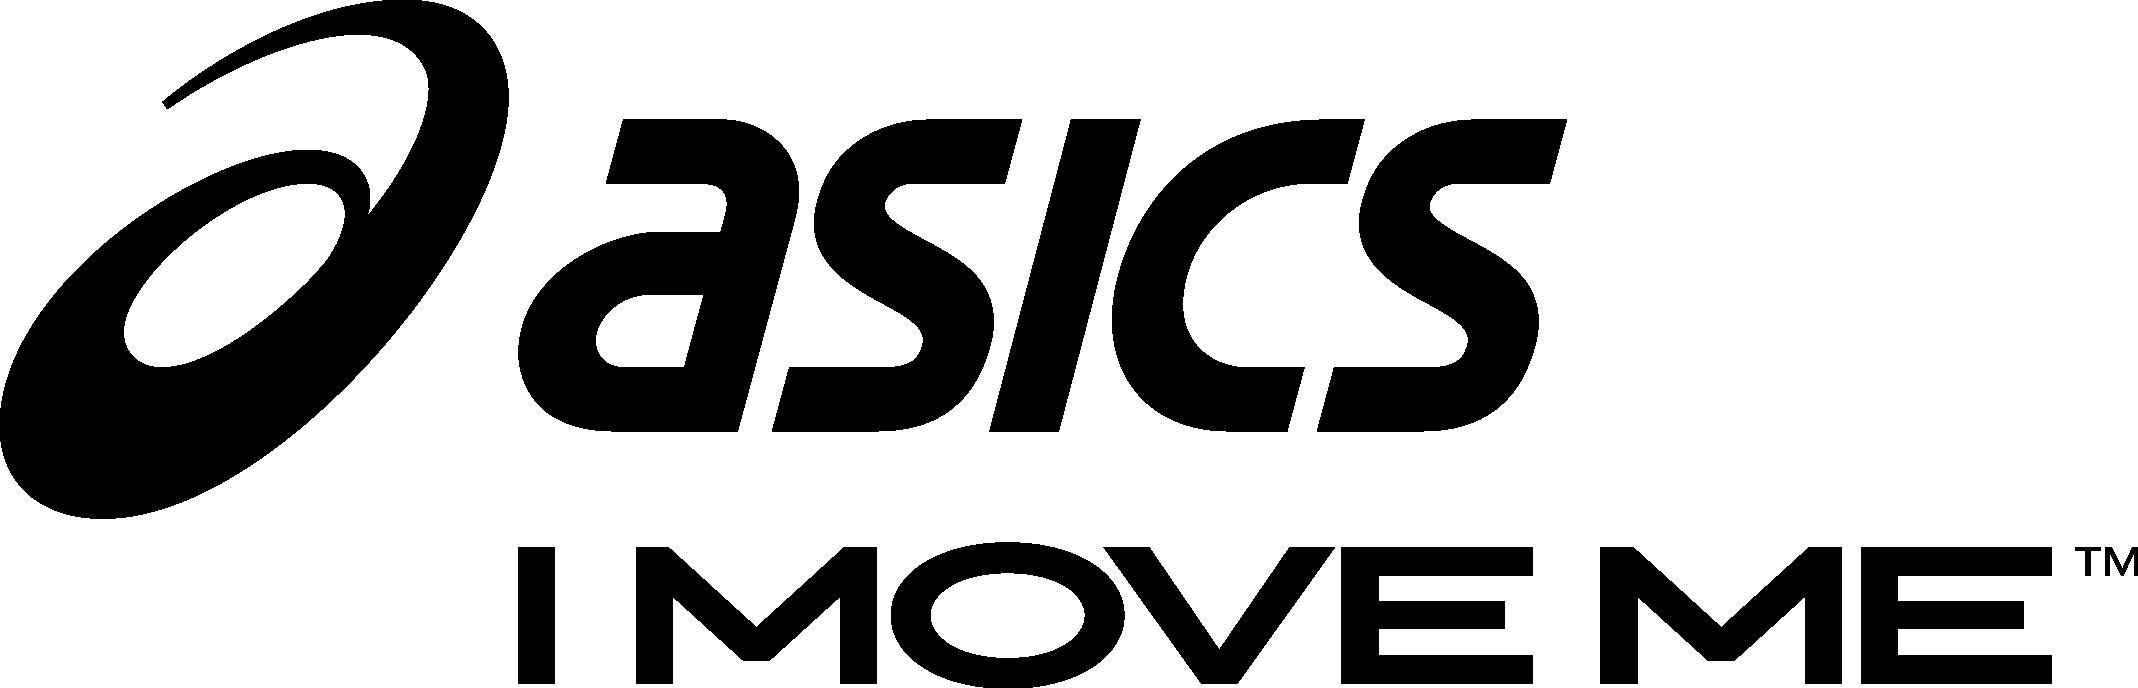 Excesivo De Dios Es  Download Gel-kenun Knit Unit - Asics I Move Me Logo - Full Size PNG Image -  PNGkit